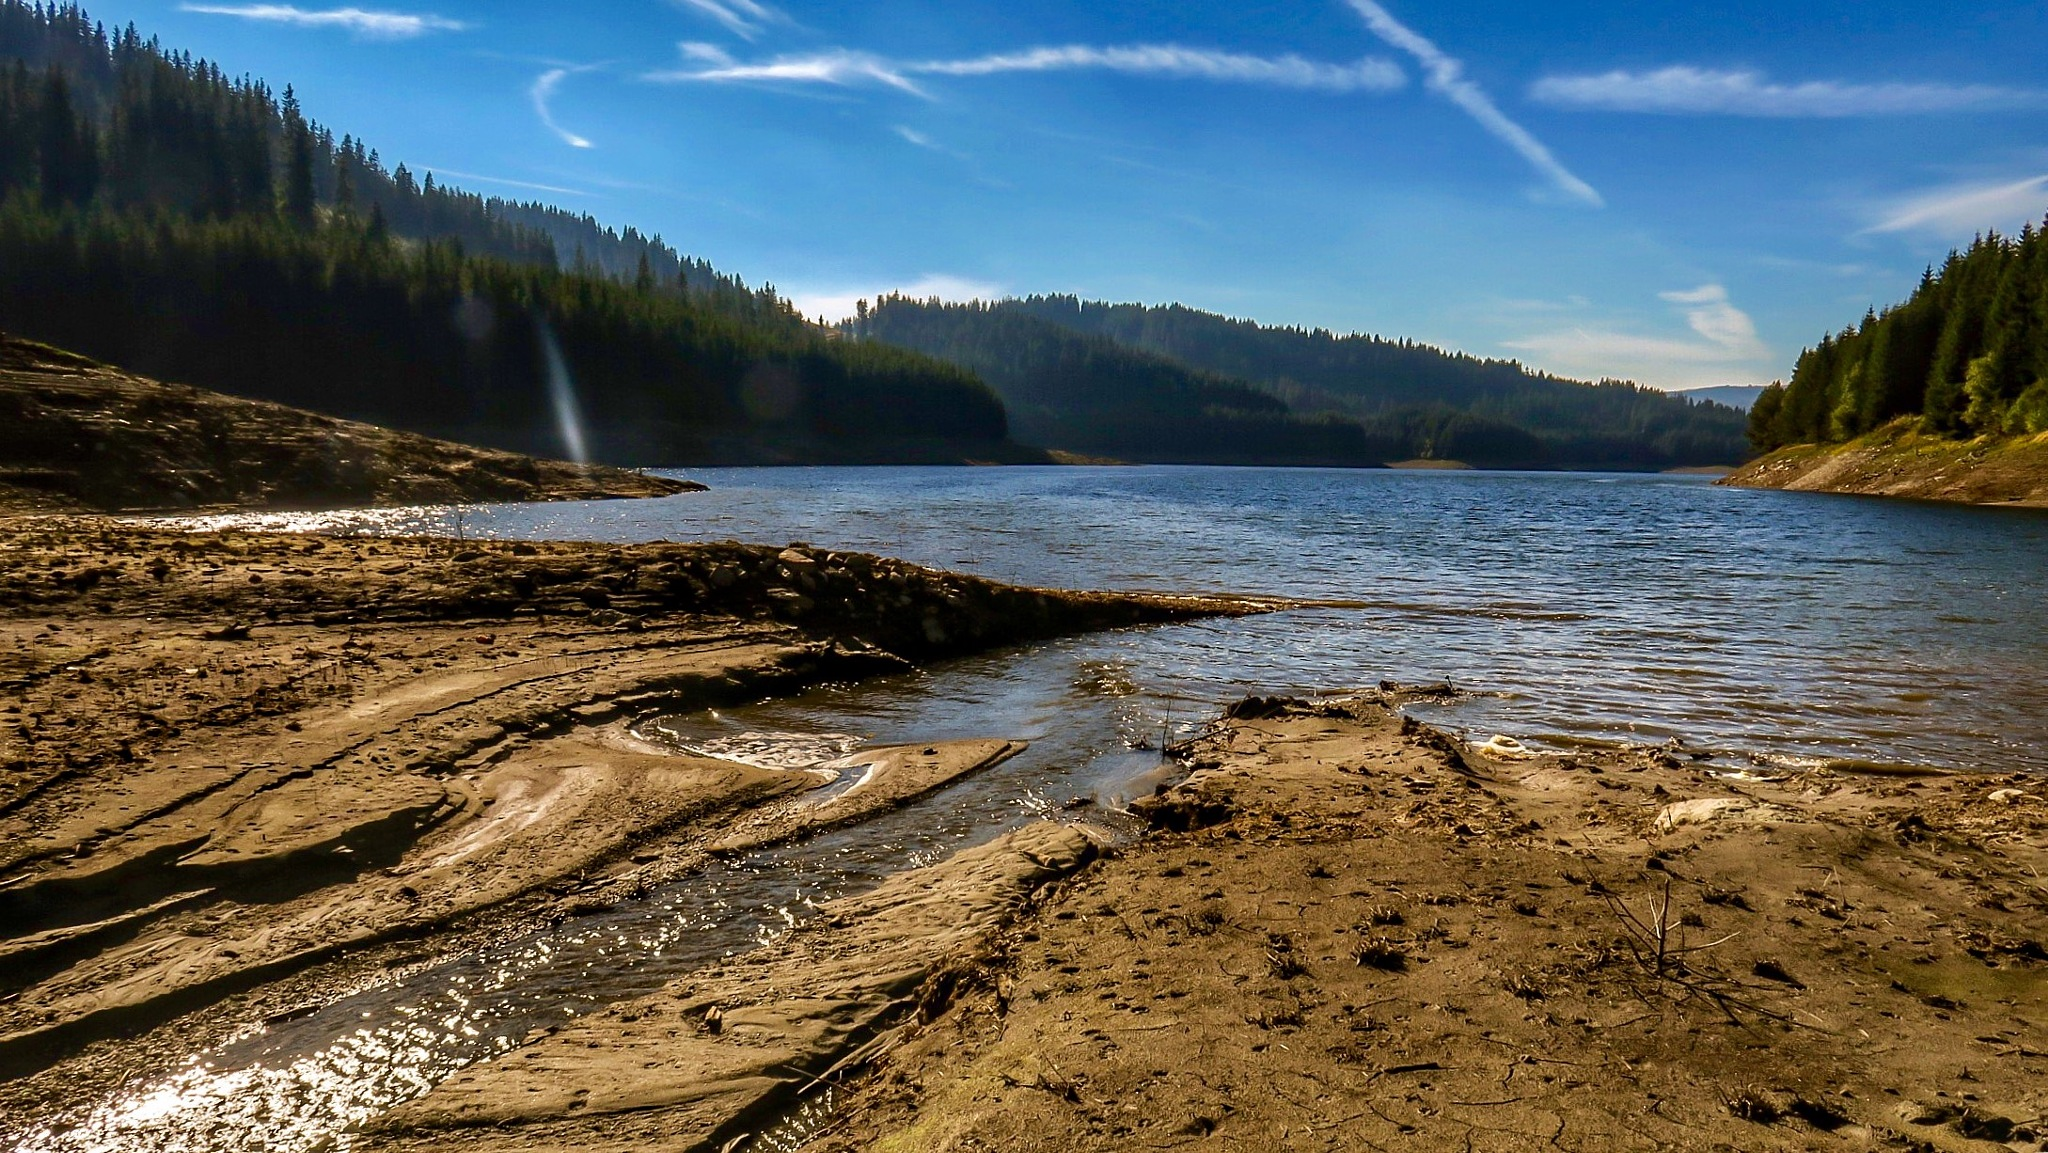 The Lake by Adi Gli